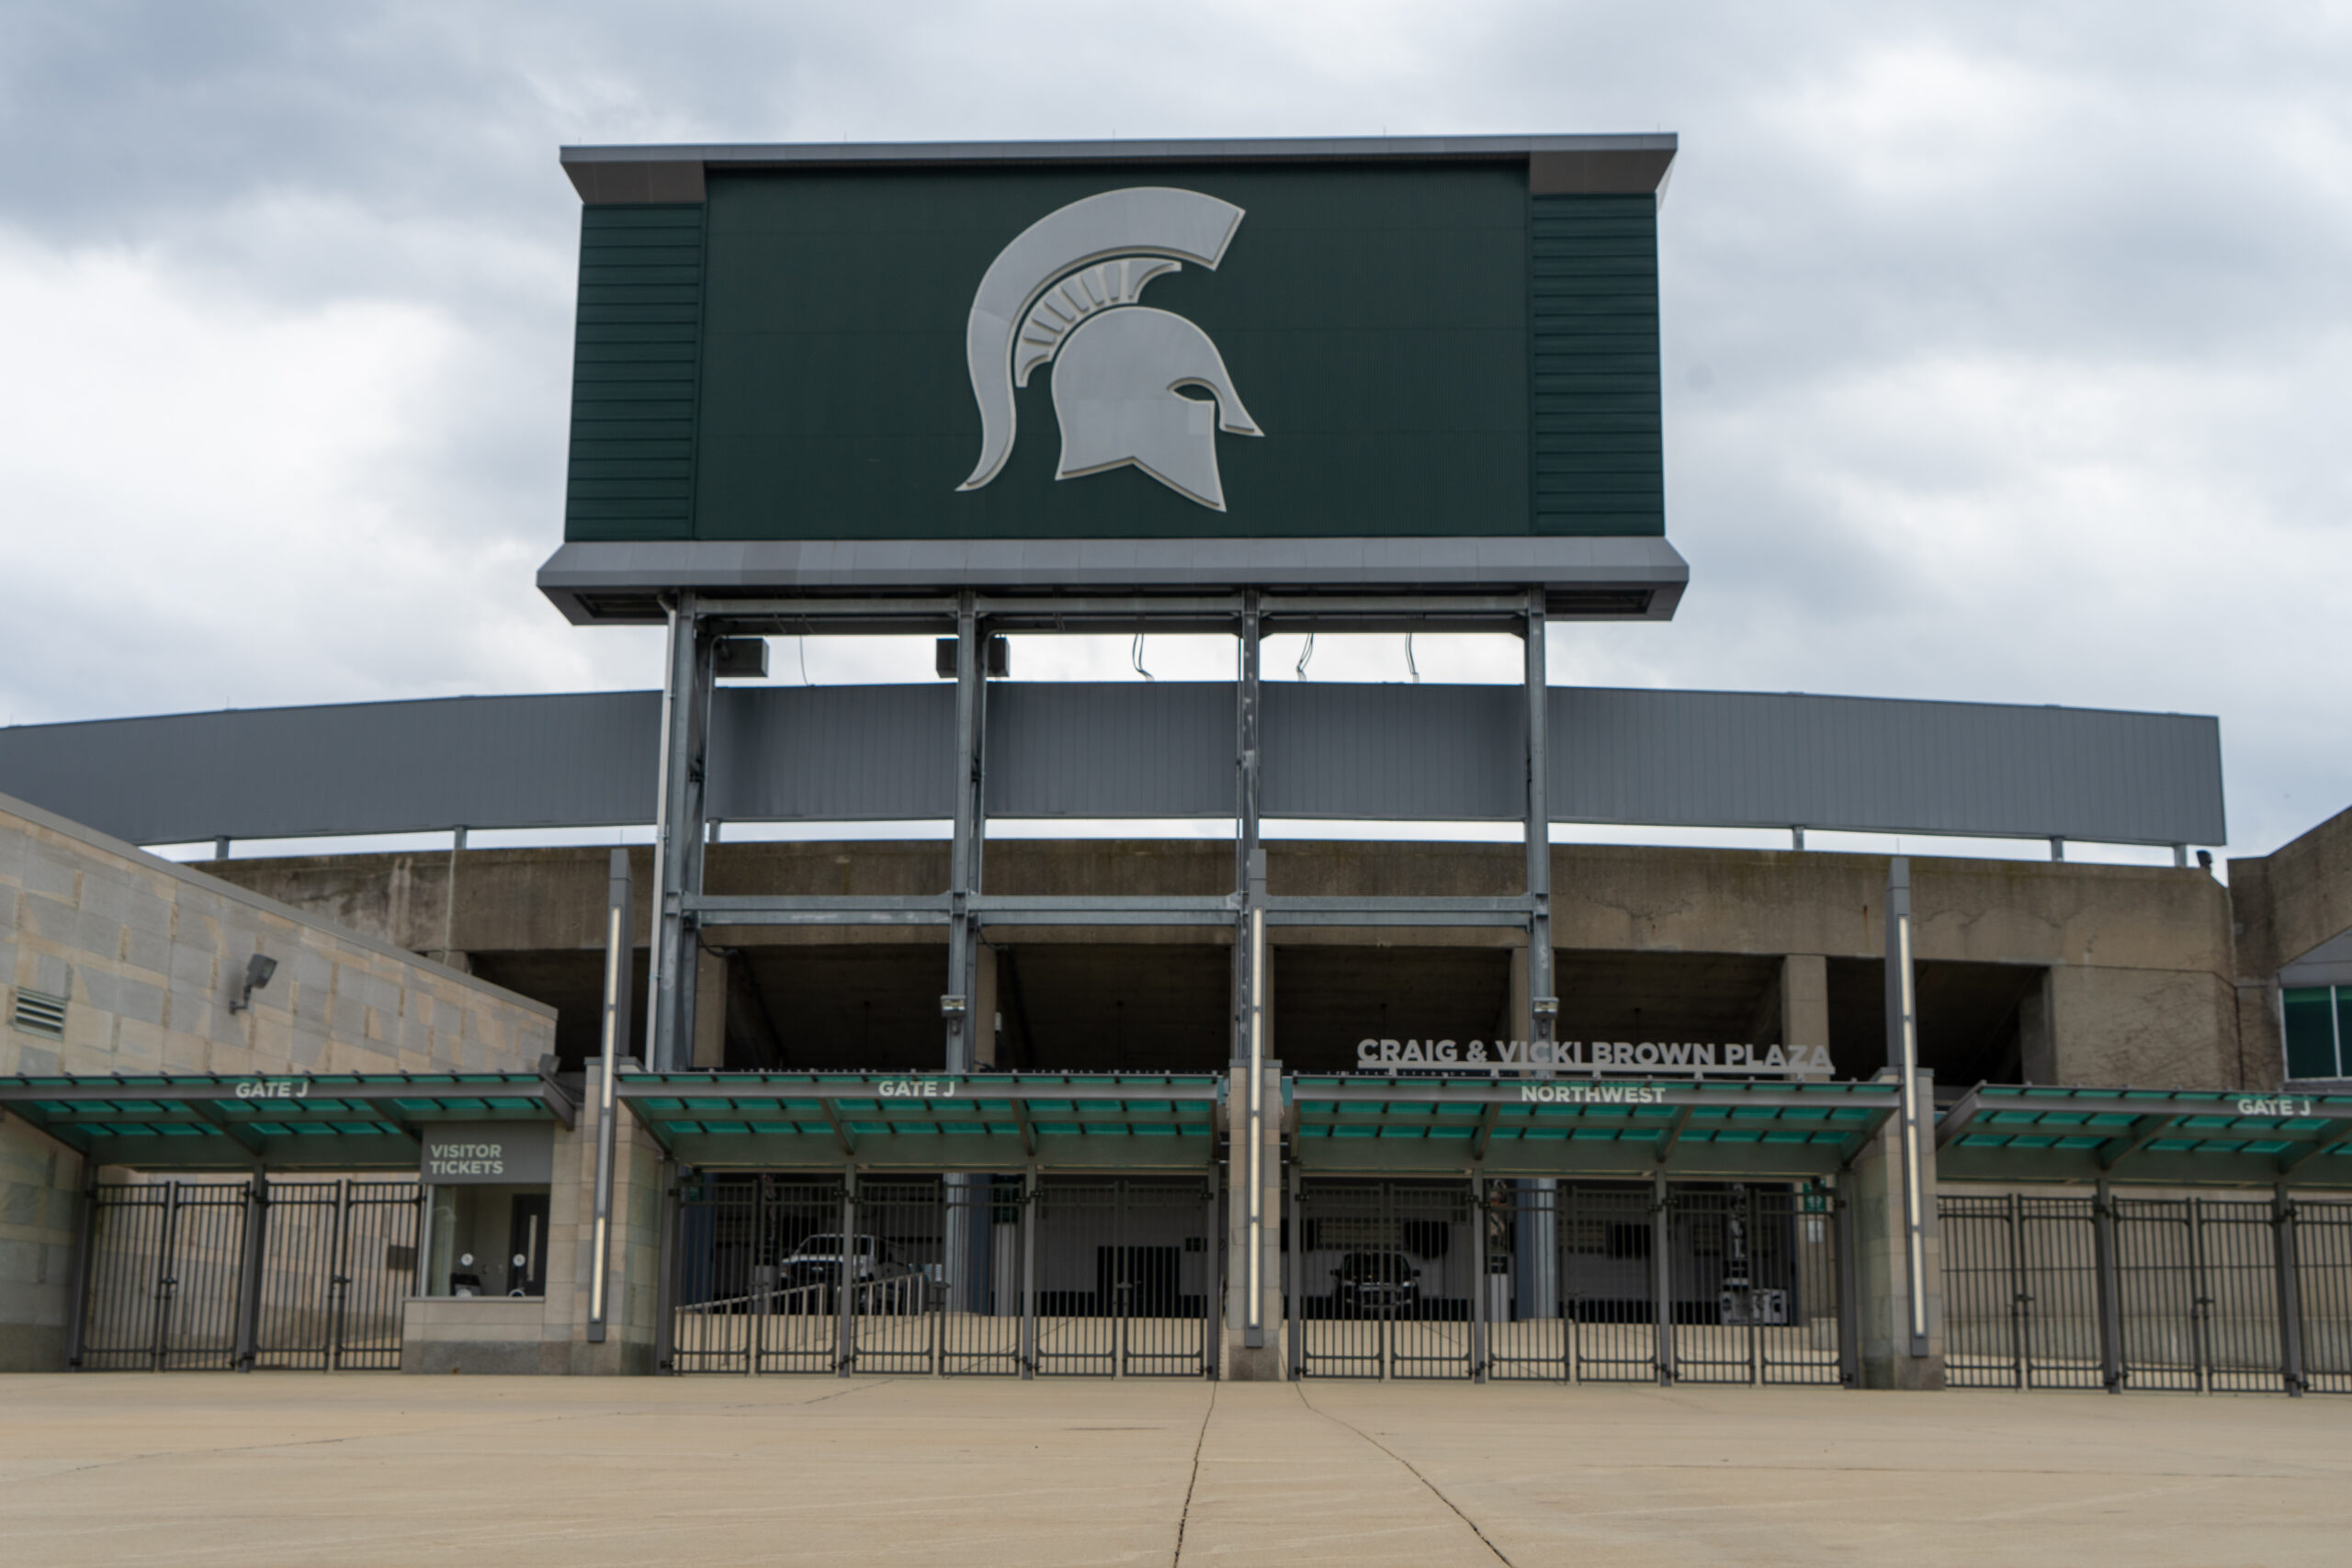 Northwest entrance of an empty Spartan Stadium.